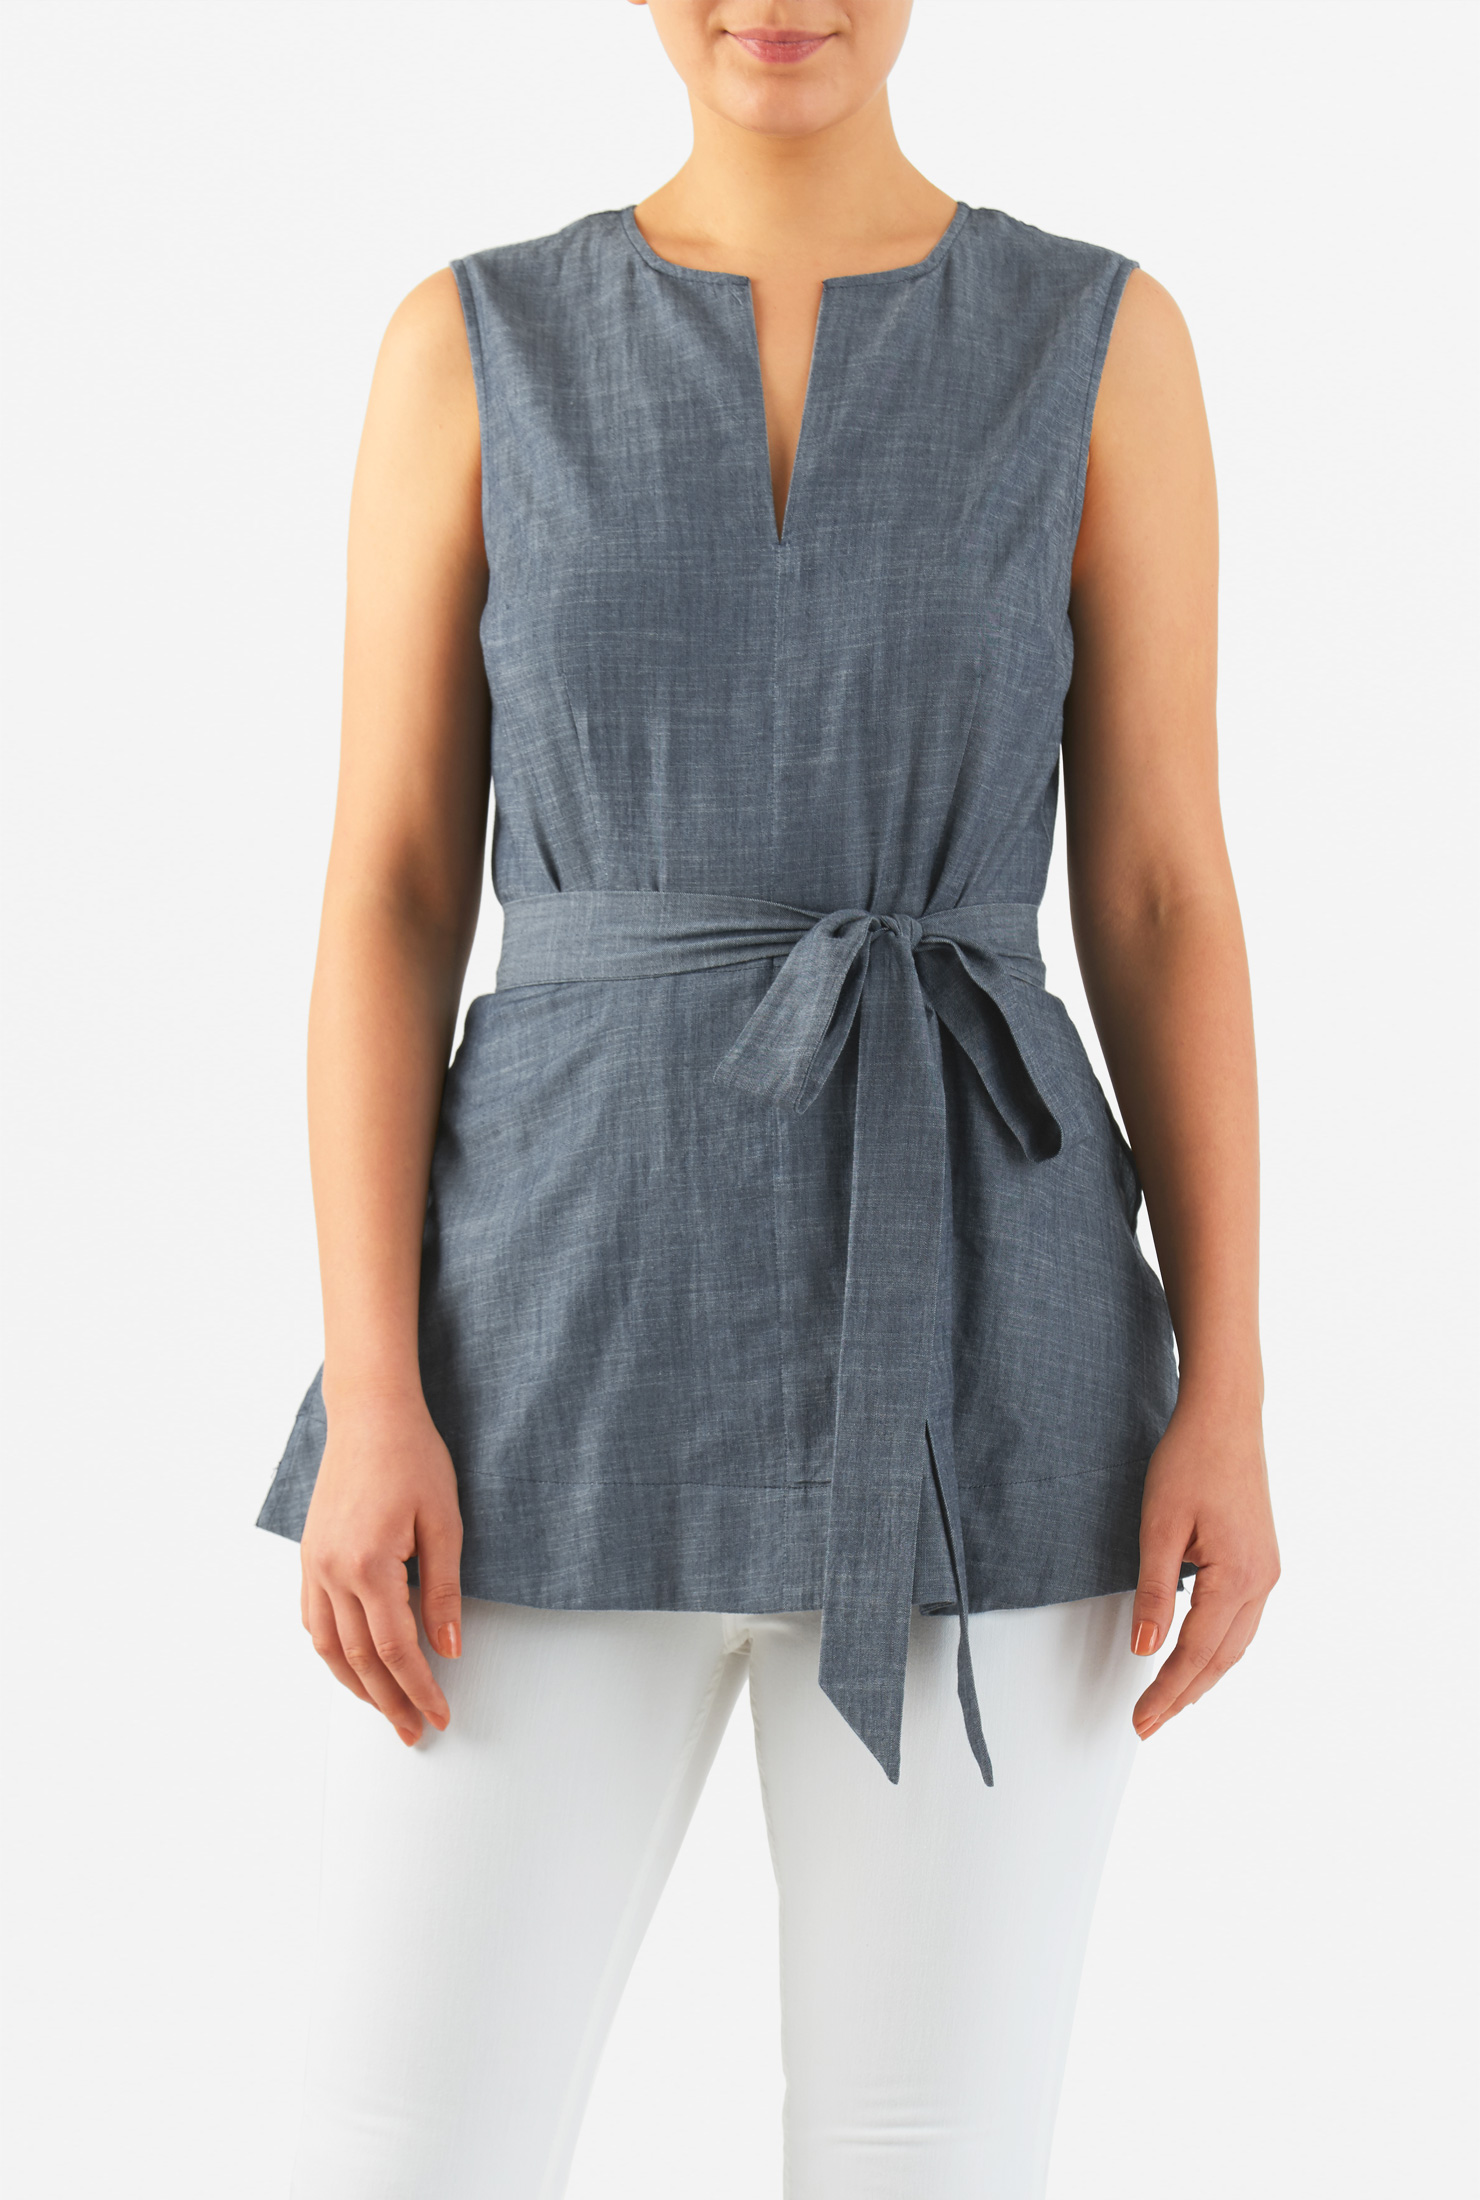 Eshakti Womens Cotton Chambray Sash Tie Belt Top